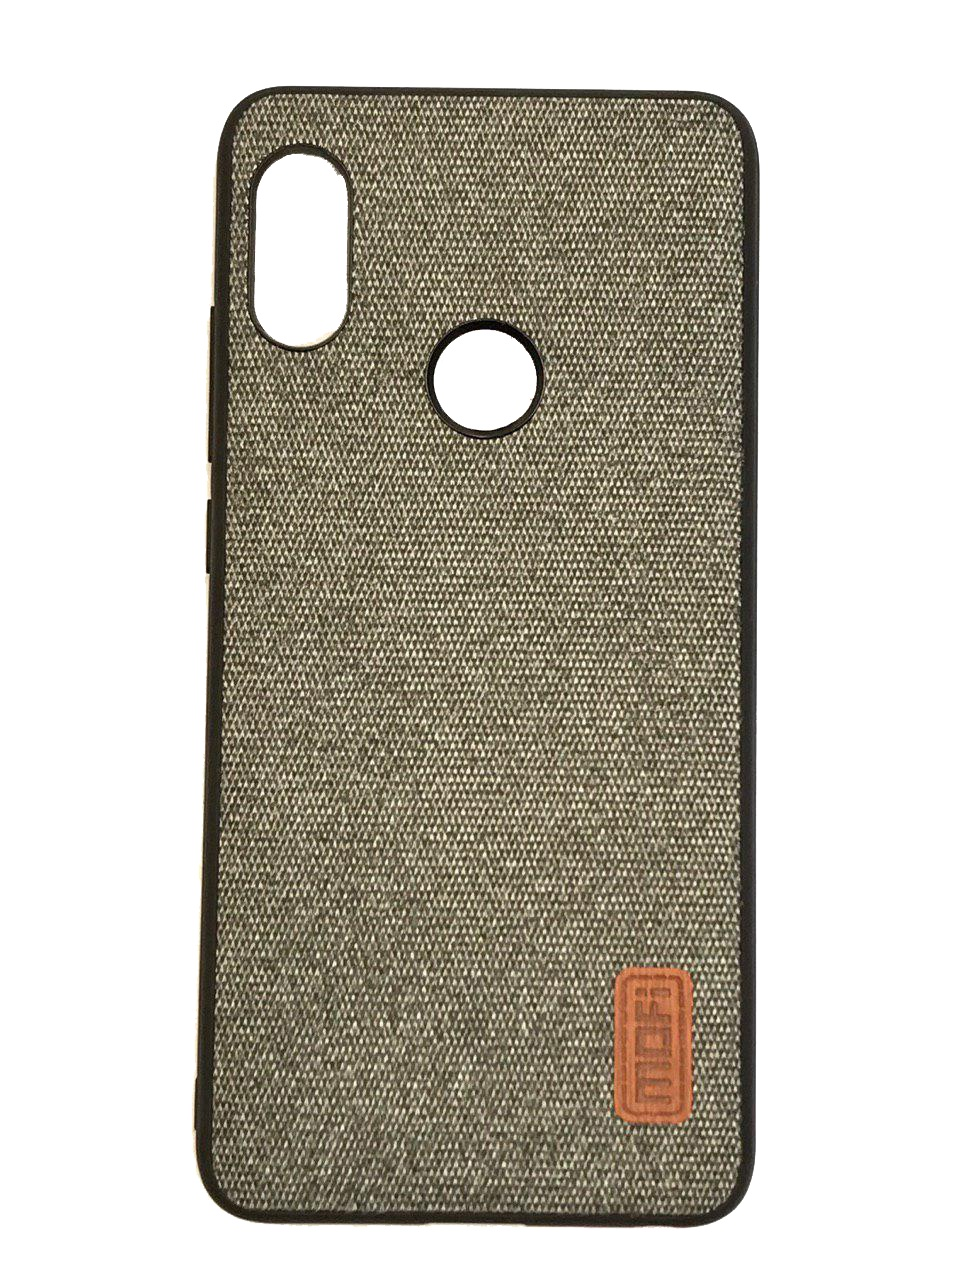 Чехол для Xiaomi Mi A2 Lite Накладка Fabric Xiaomi Redmi 6 Pro /A2 Lite Gray чехол для сотового телефона mofi накладка fabric xiaomi redmi note 5 note 5 pro gray серый